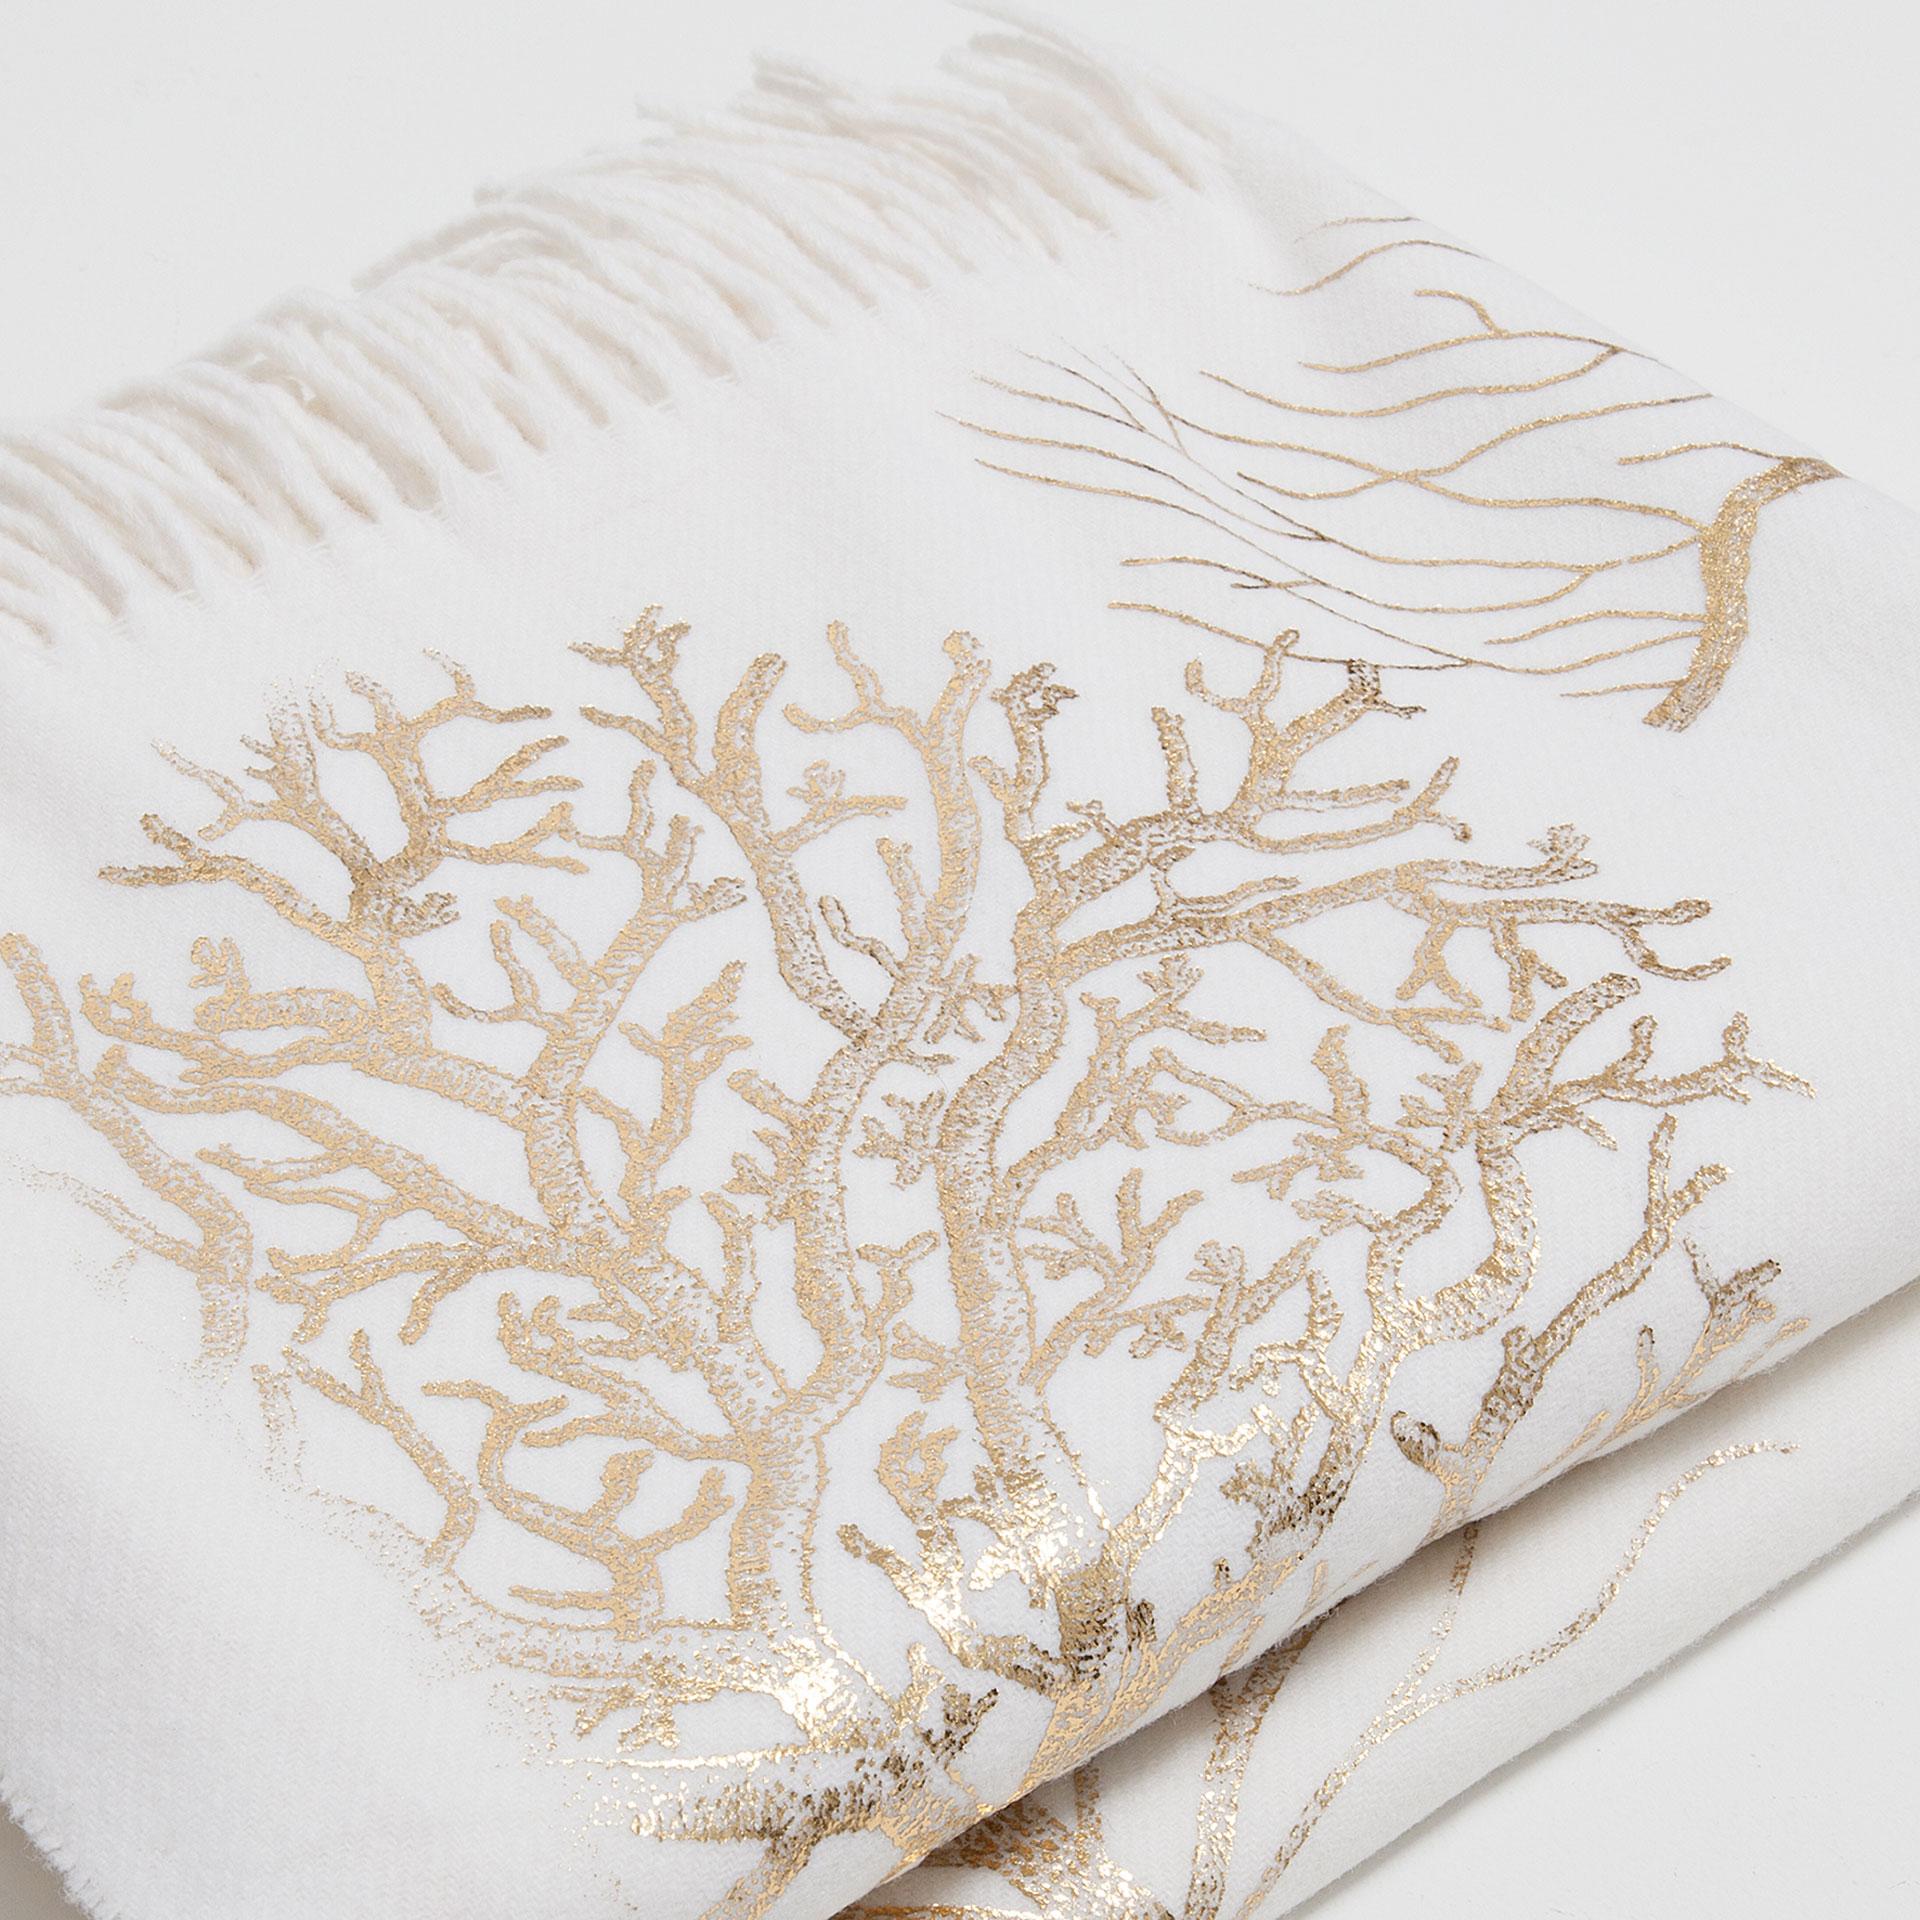 2017 nin en g zel battaniye modelleri cool kad n - Zara home almeria ...